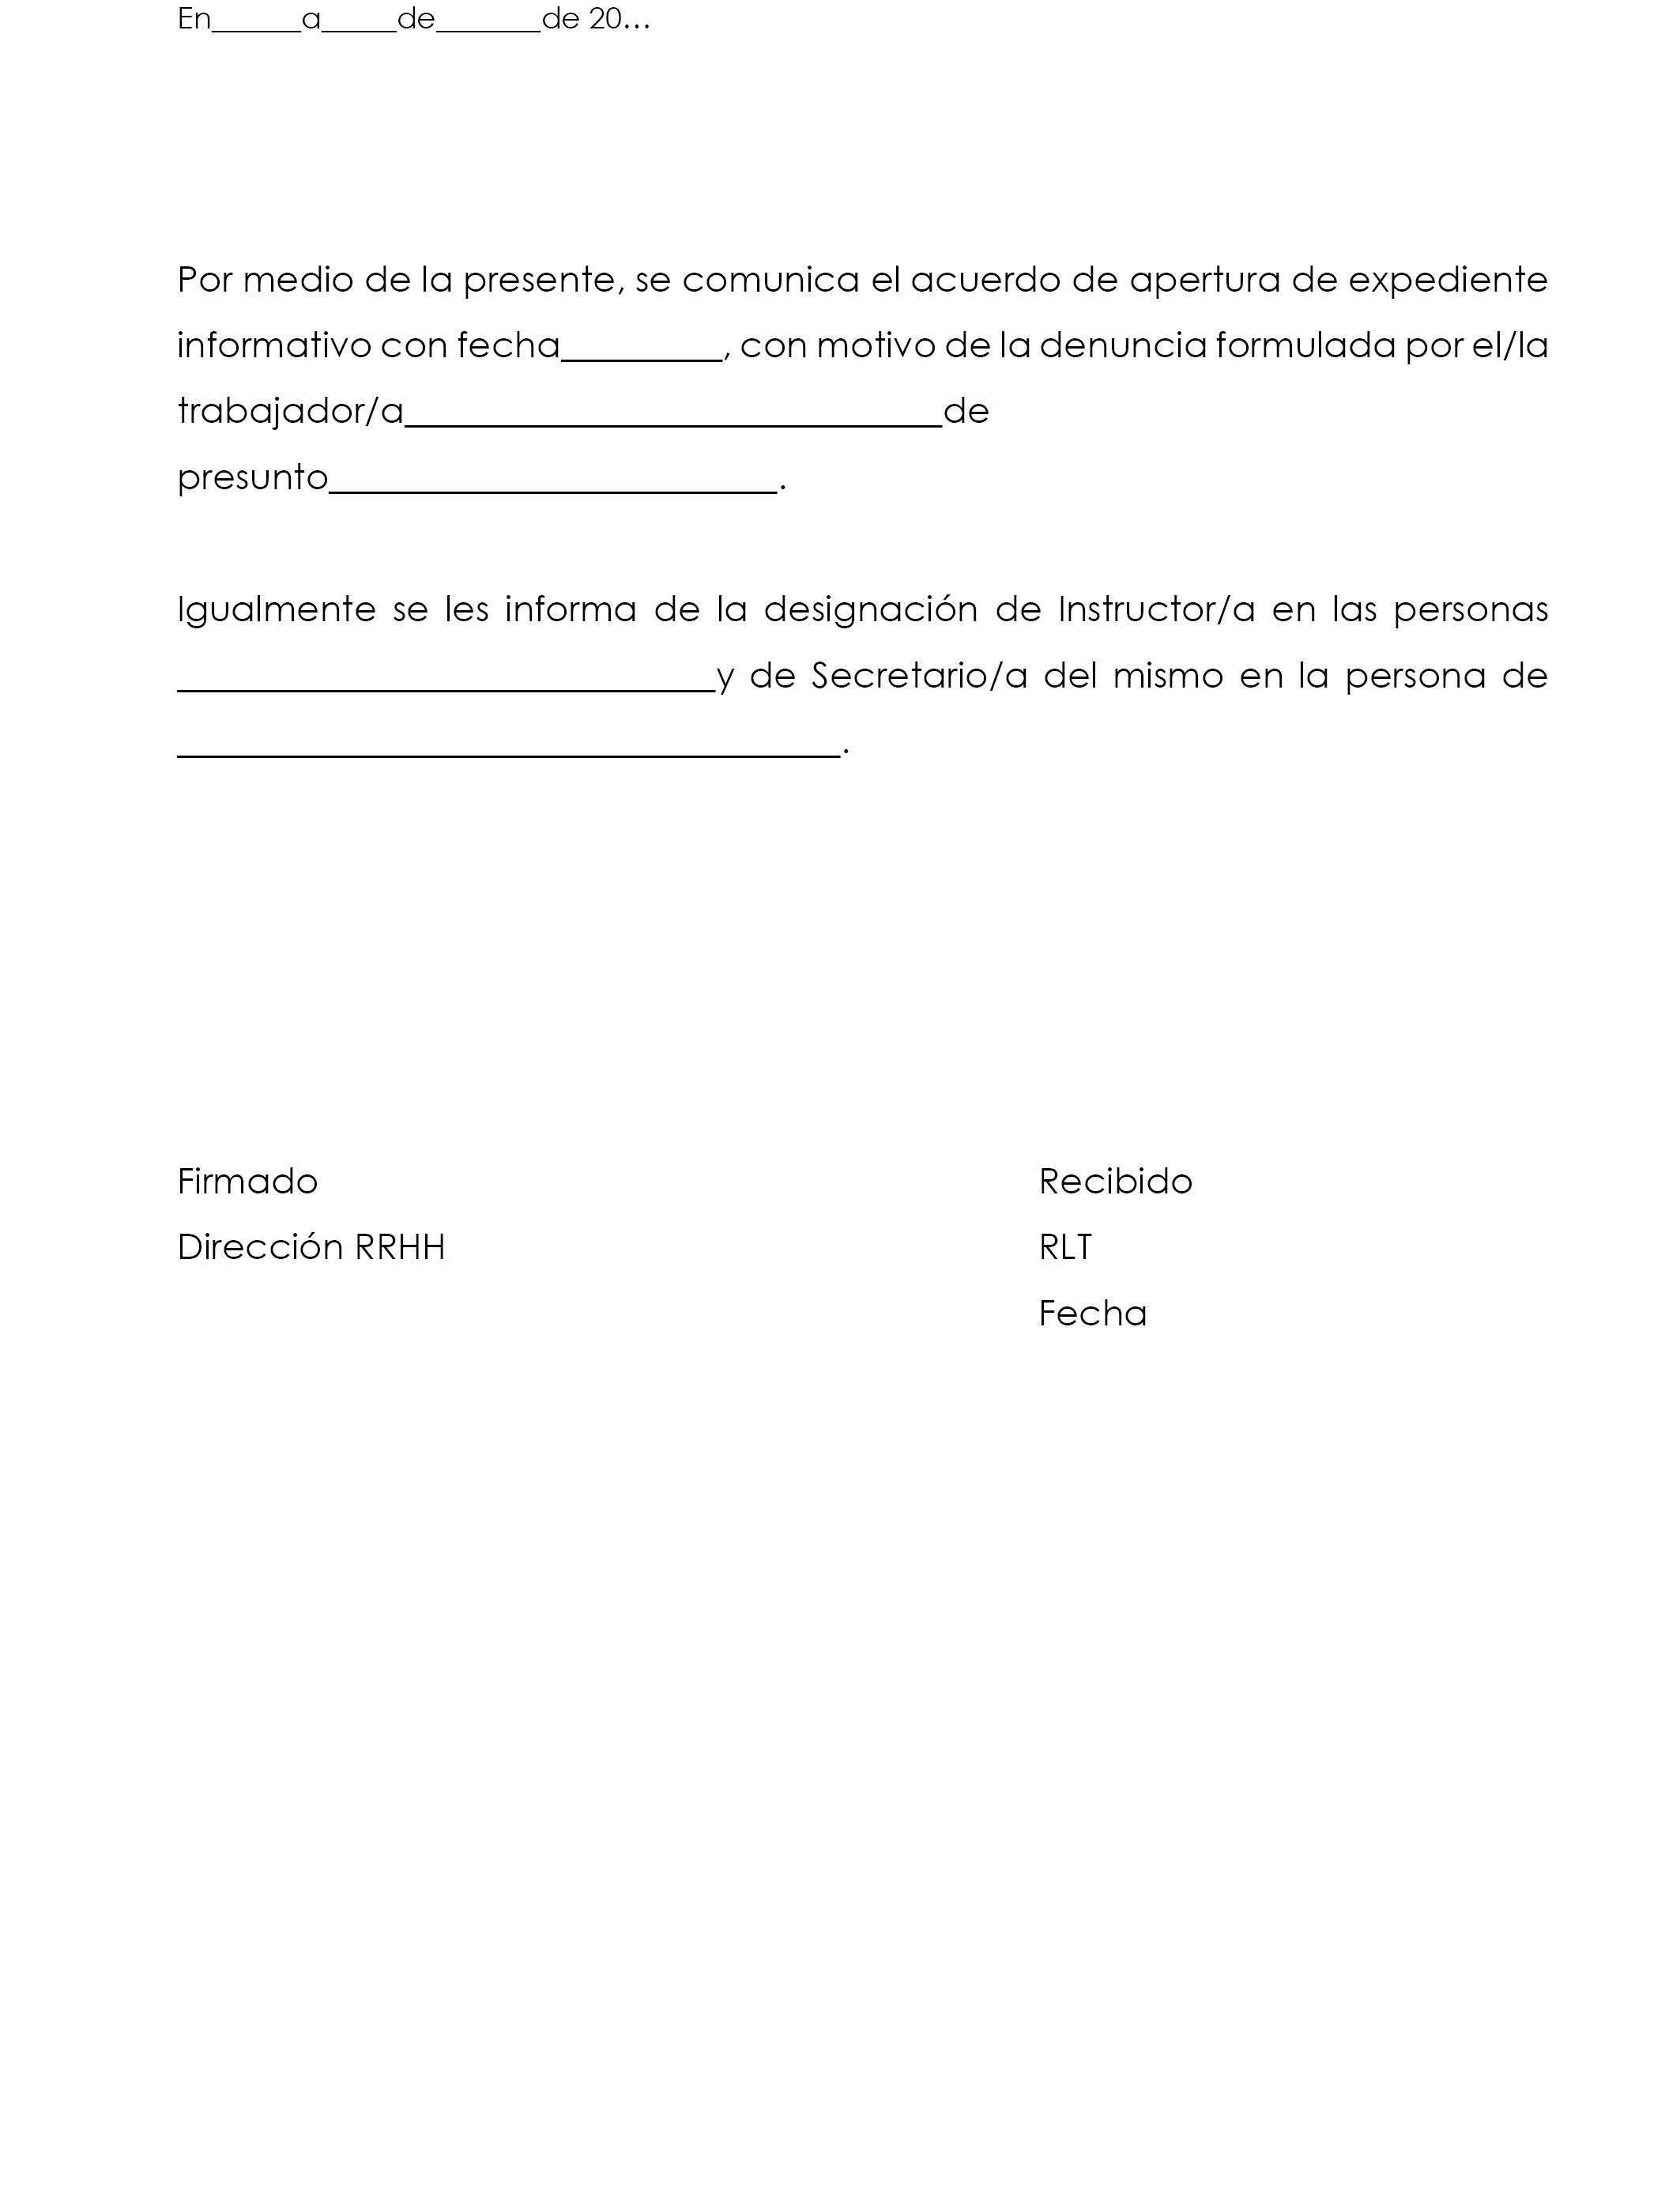 BOE.es - Documento BOE-A-2017-45